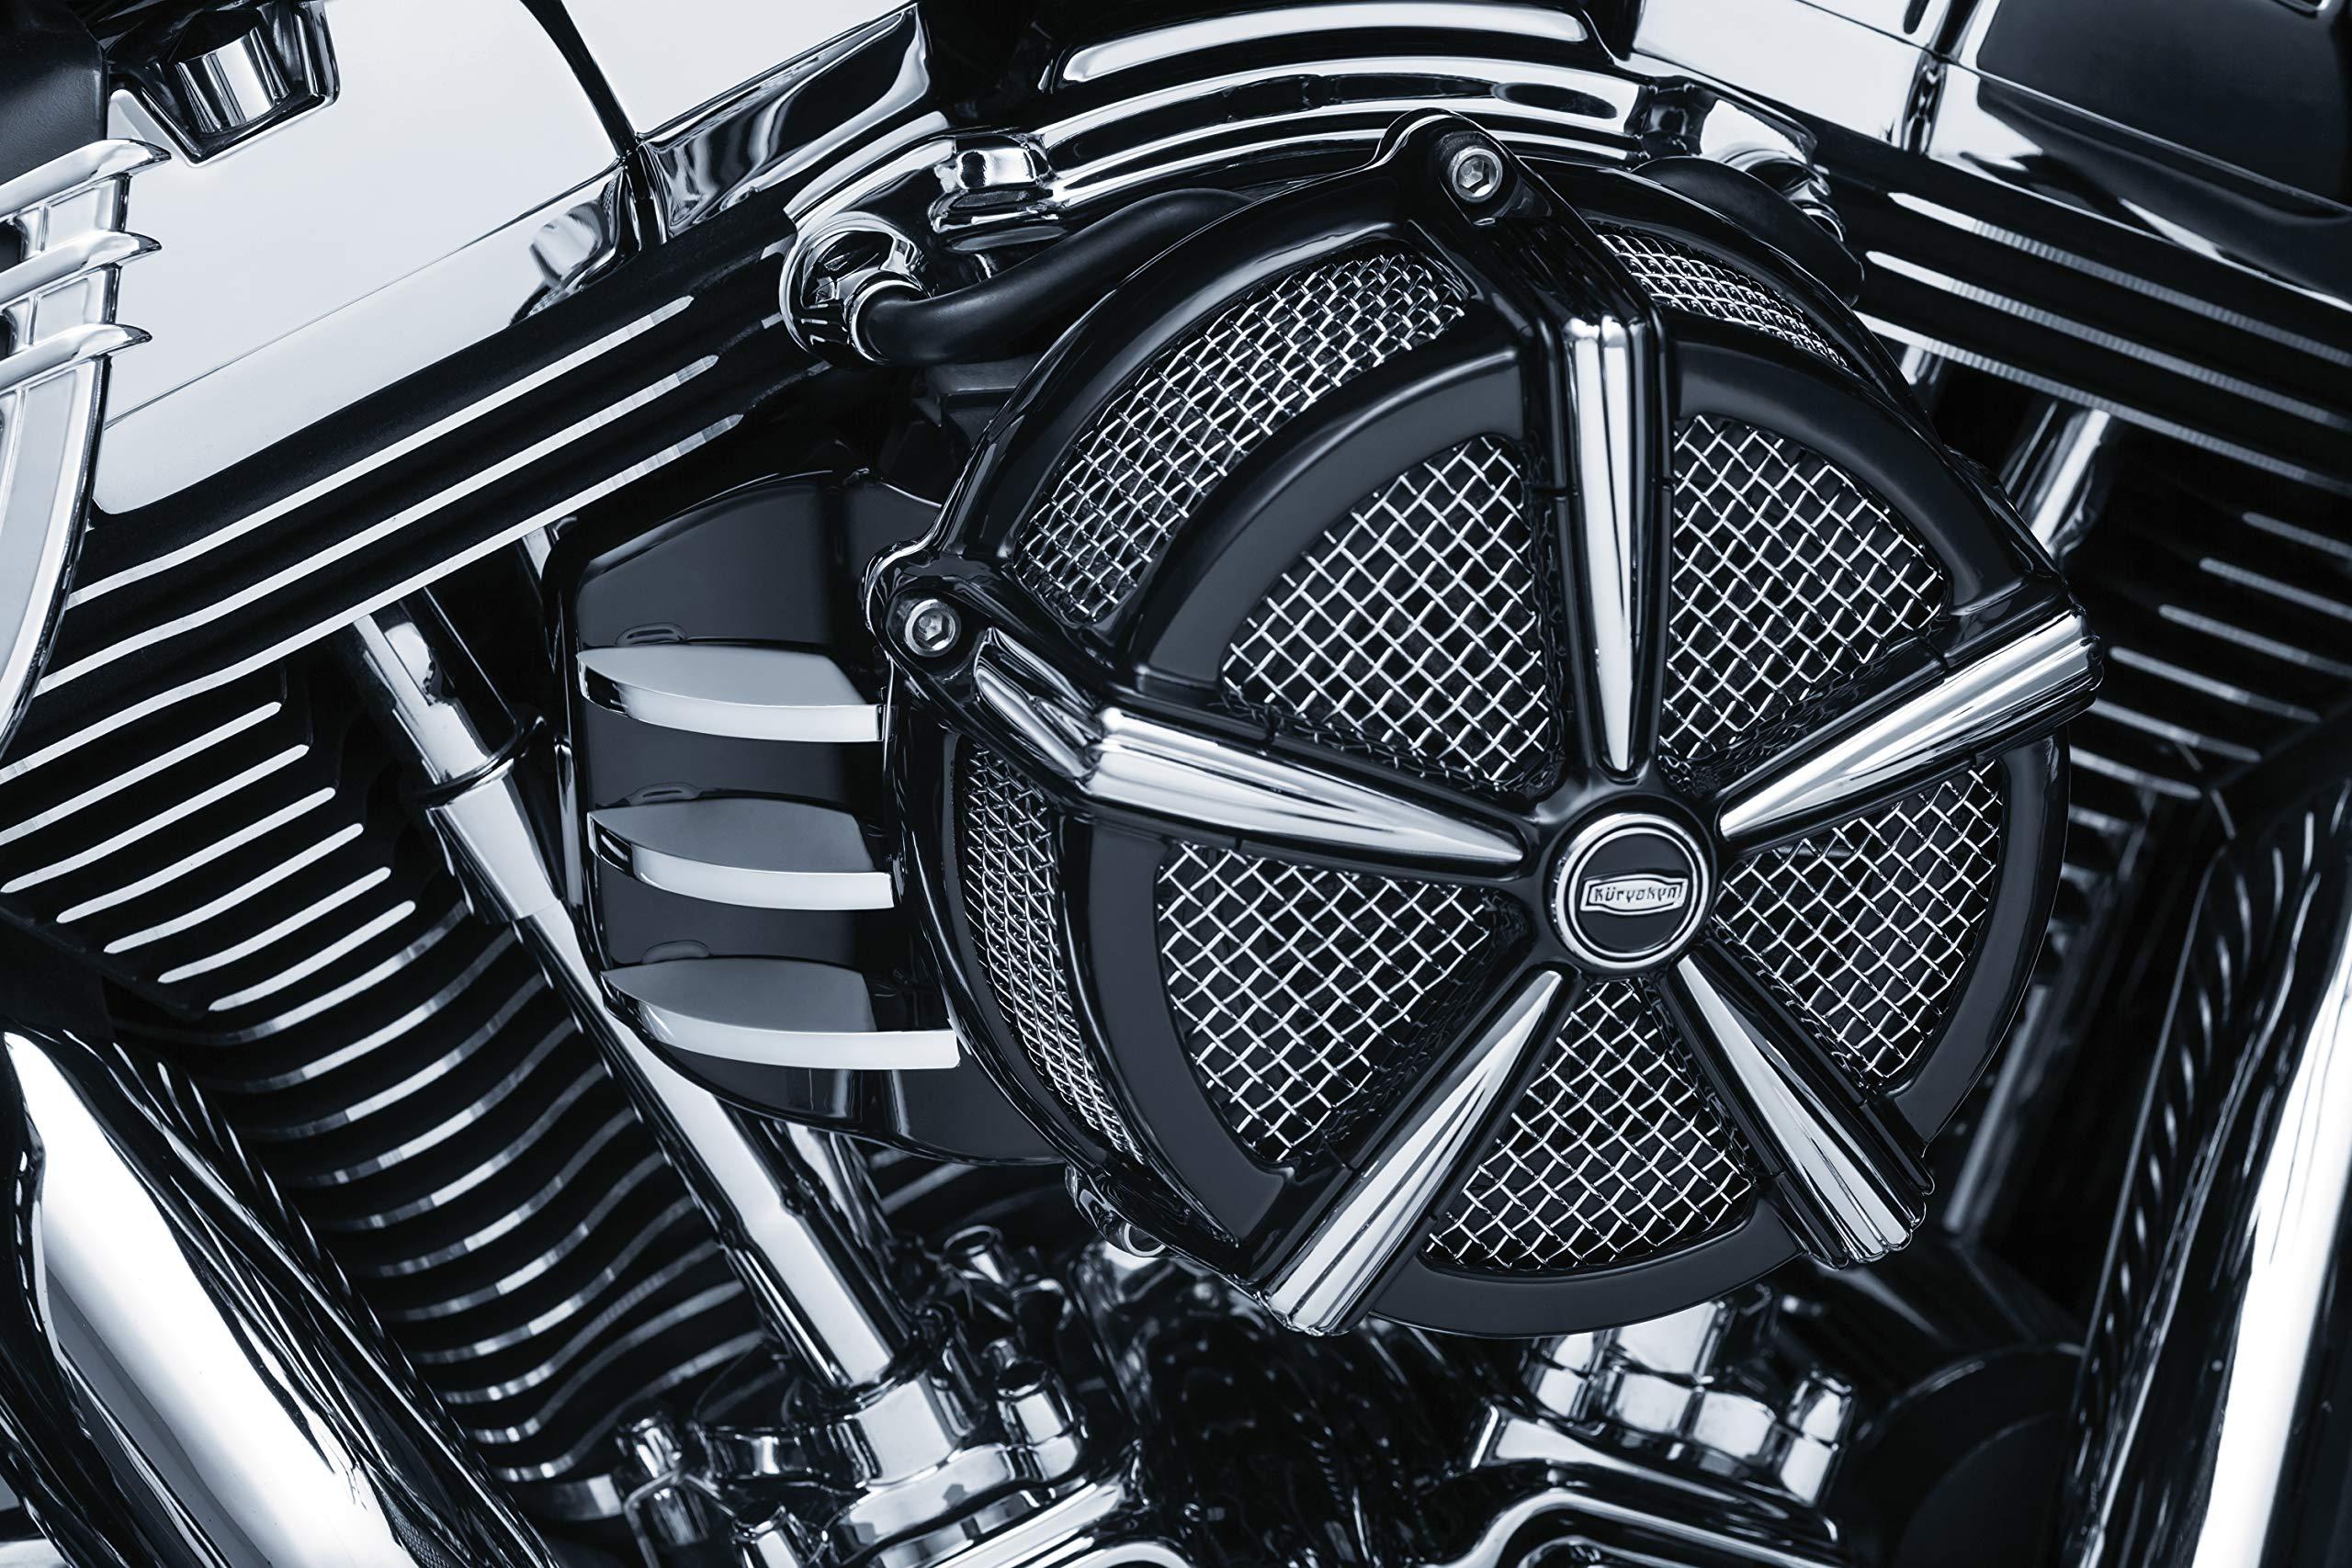 Kuryakyn 5686 Black & Chrome Motorcycle Accent